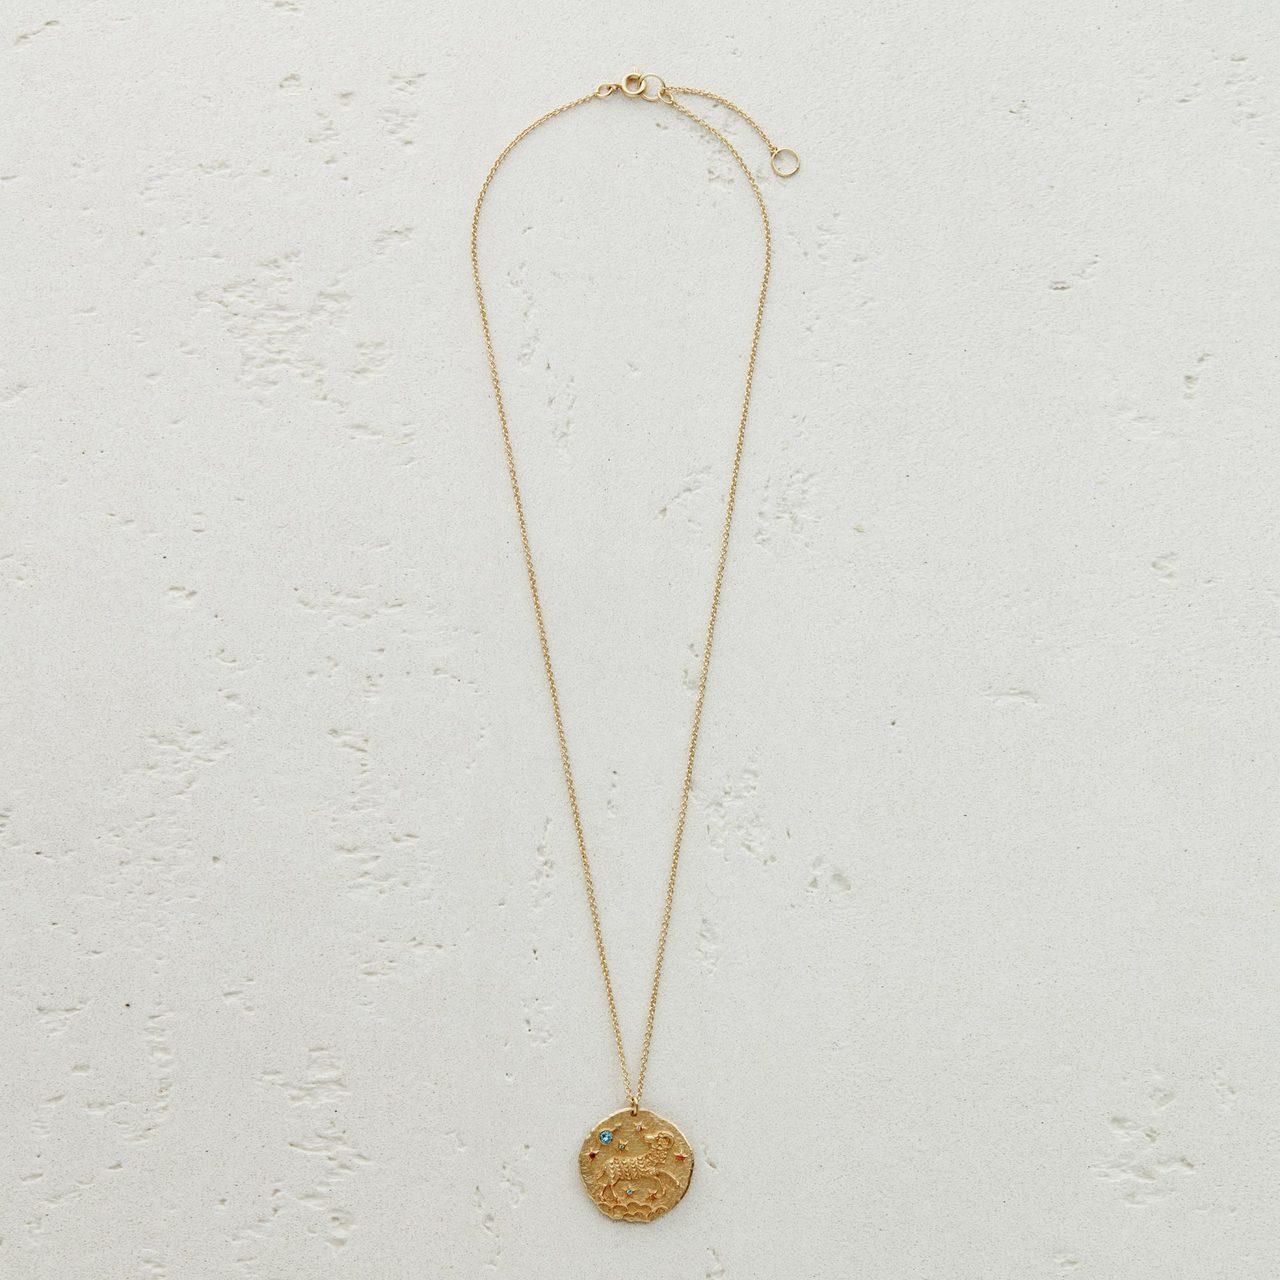 AriesZodiac Sign Necklace - Gold